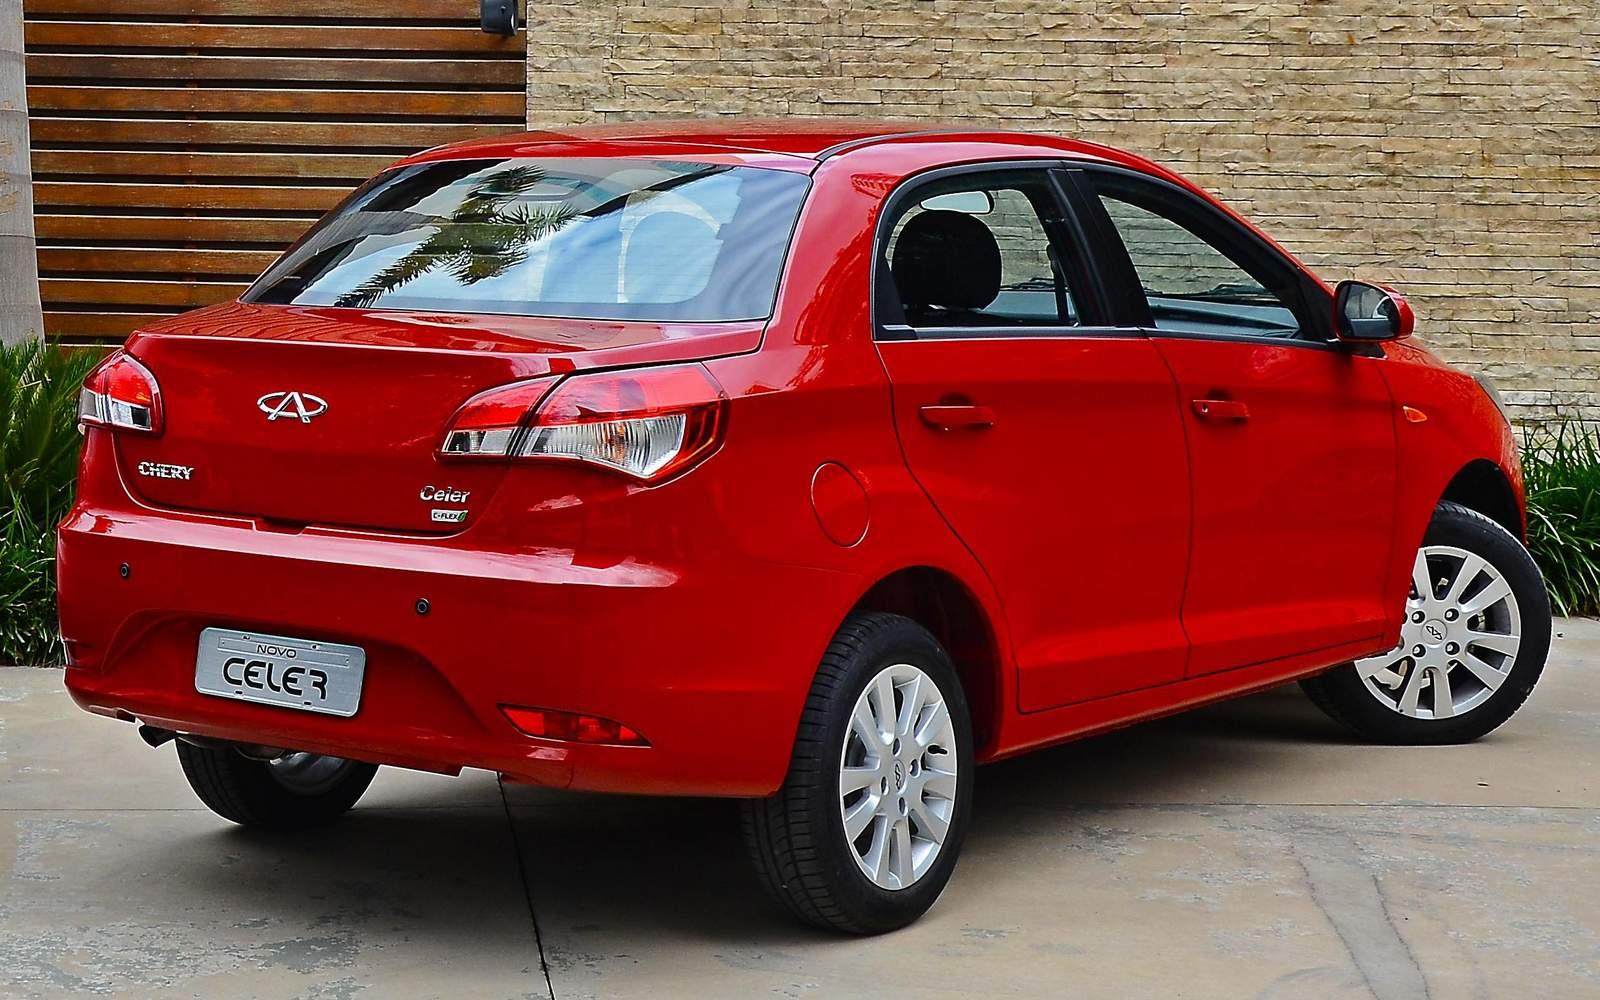 Chery Celer Sedan Preco Cai Para R 31 990 Reais Agosto Car Blog Br